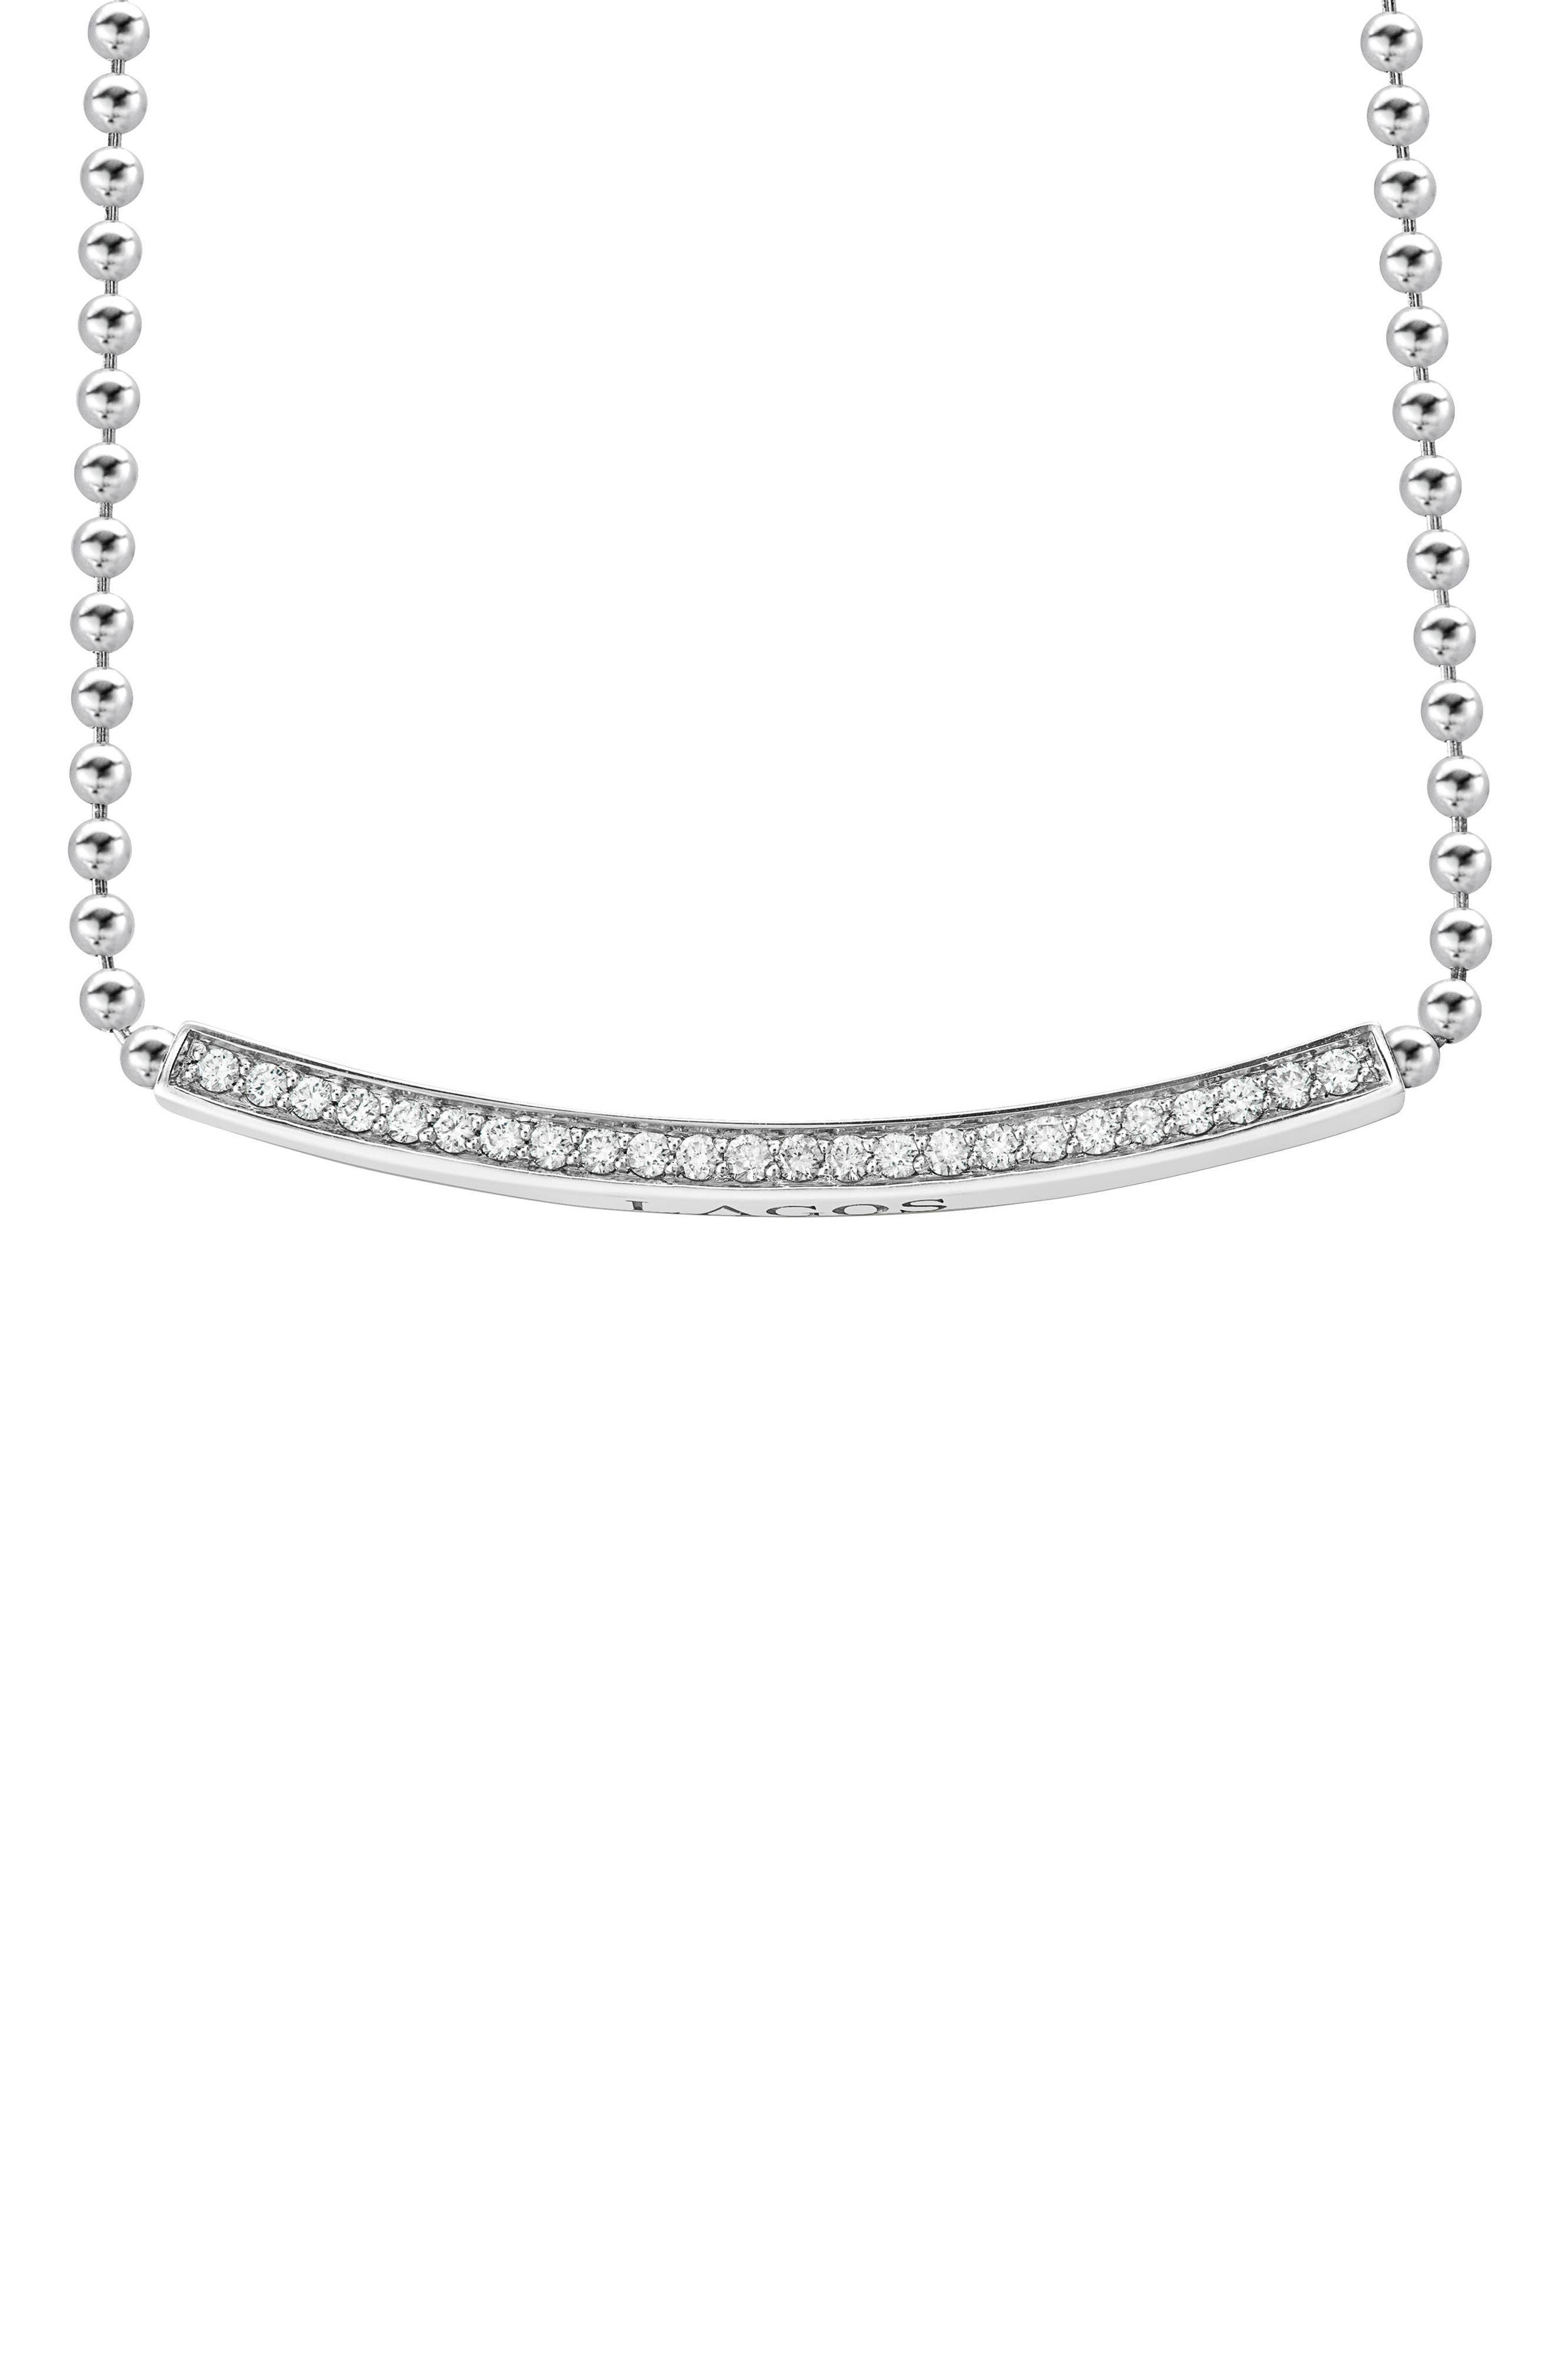 Caviar Spark Diamond Bar Necklace,                             Alternate thumbnail 3, color,                             SILVER/ DIAMOND